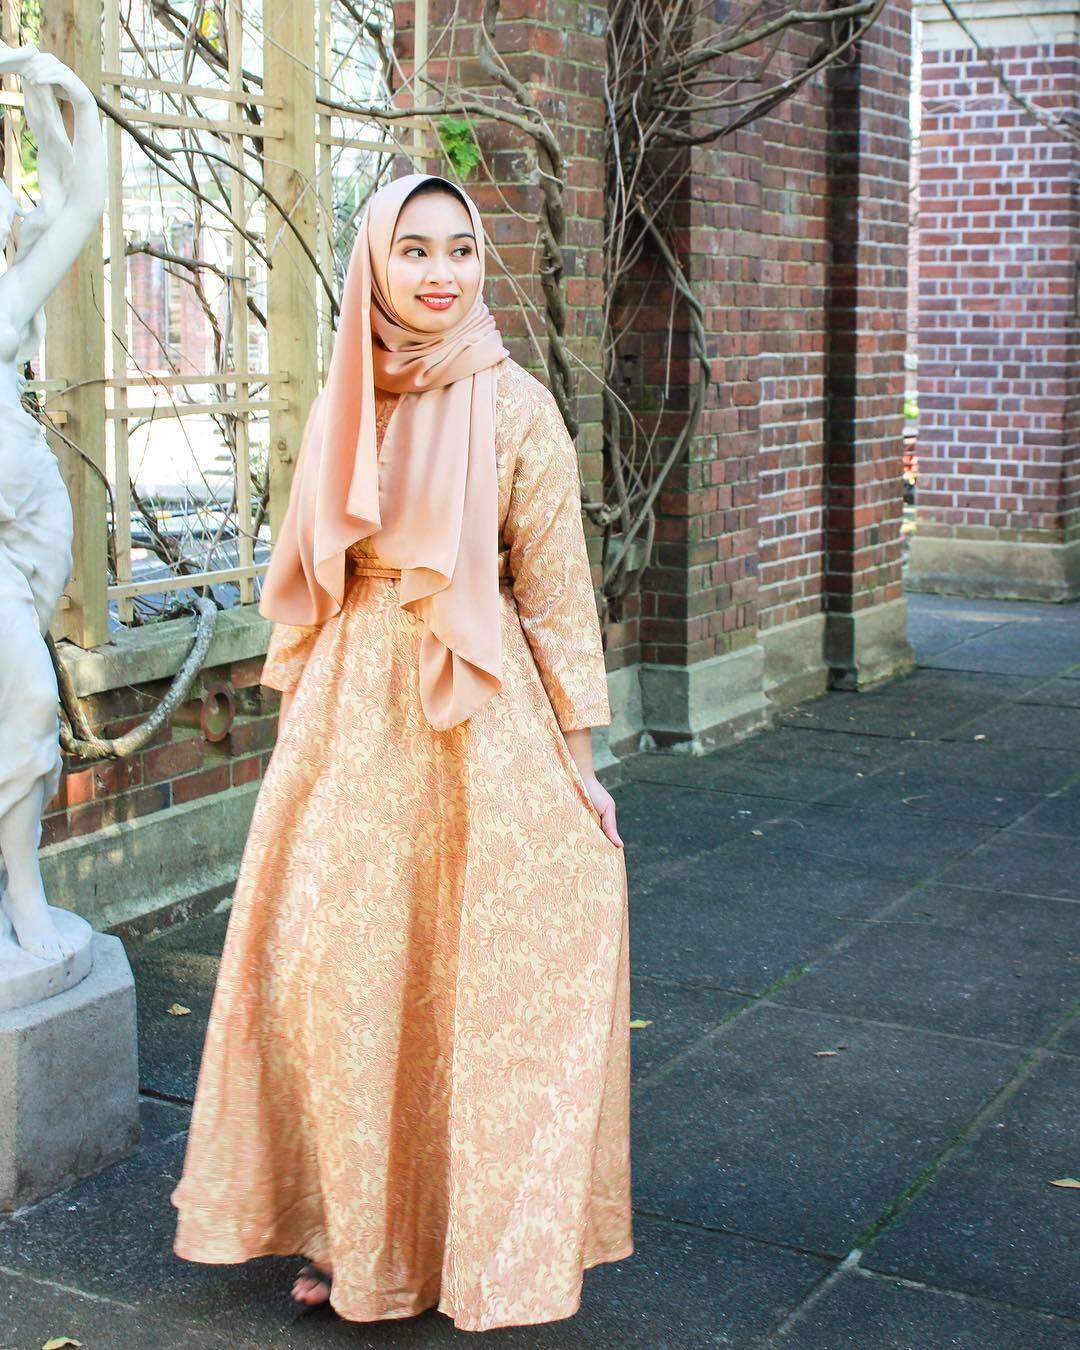 10 Potret Nurul Shamsul, Hijaber Finalis Miss Universe Selandia Baru